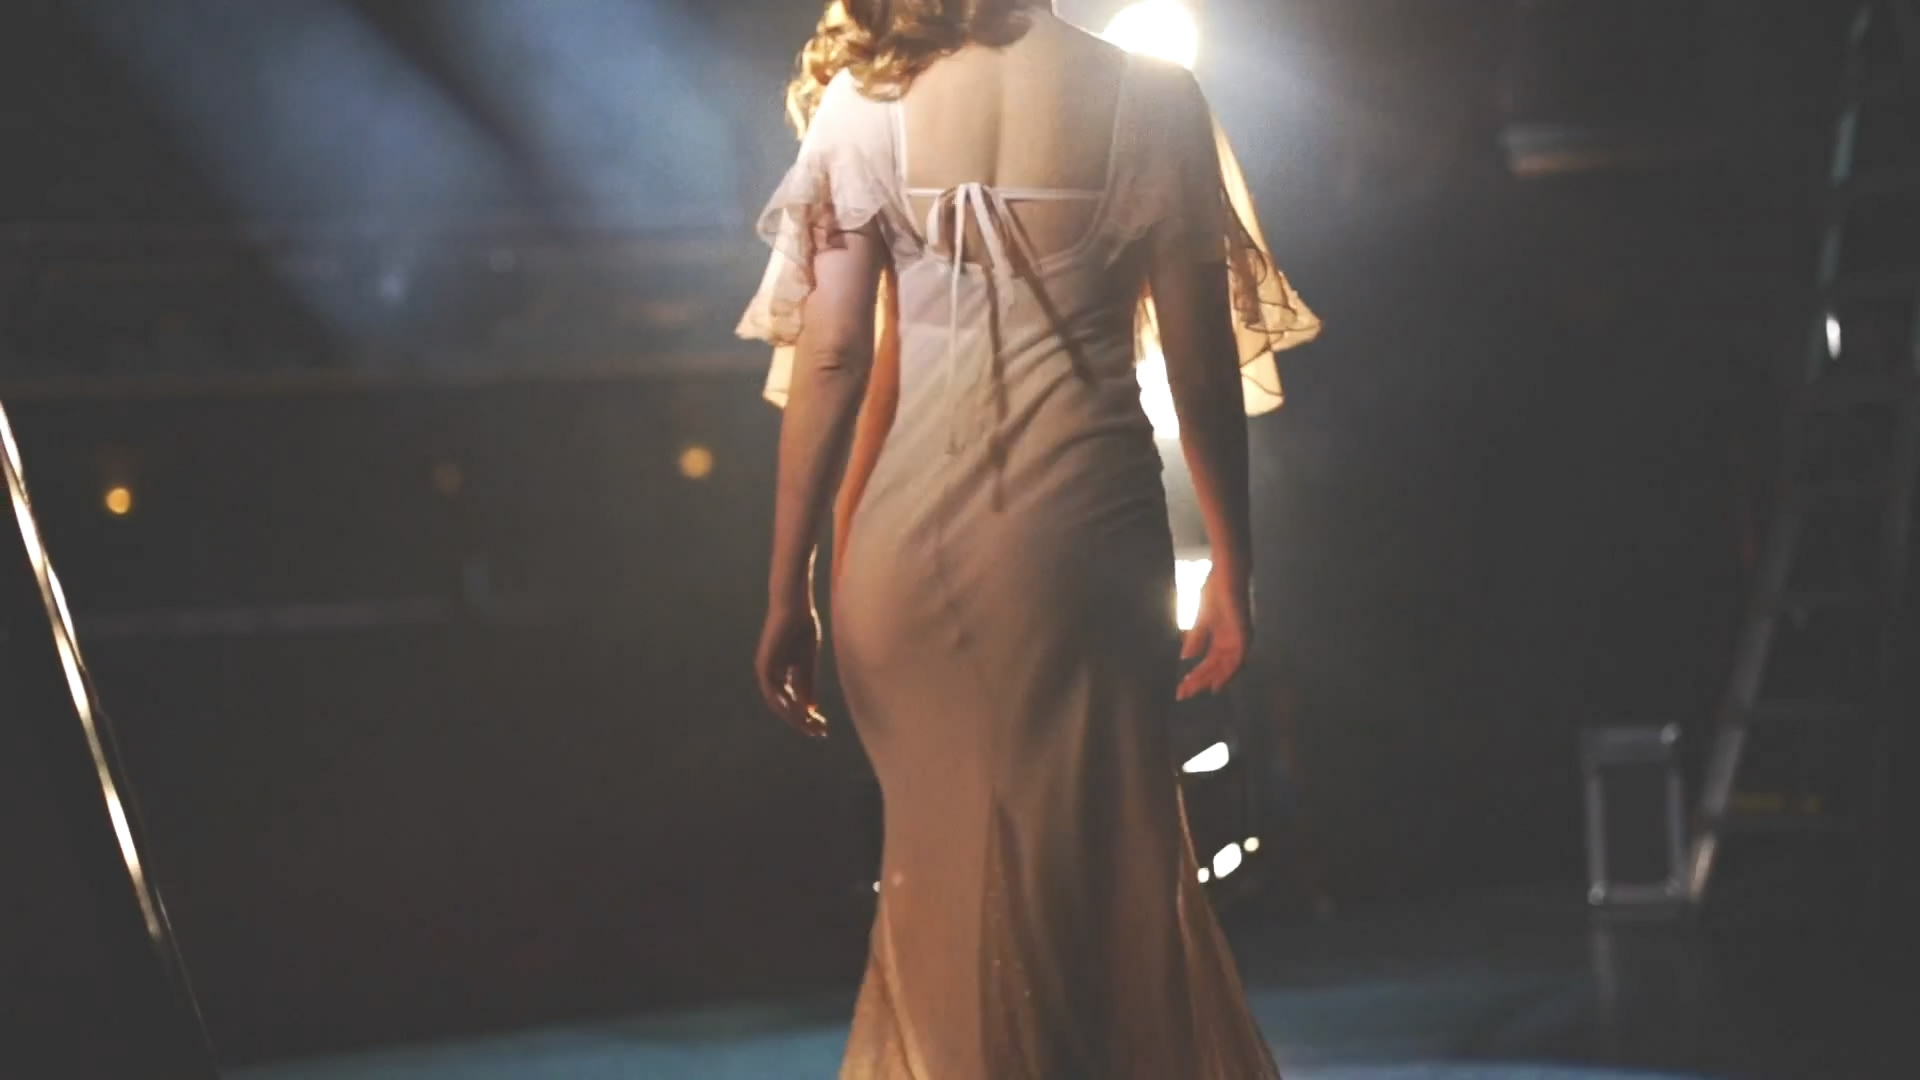 Kelly Brook - Audition Perfume Photoshoot_6.jpg